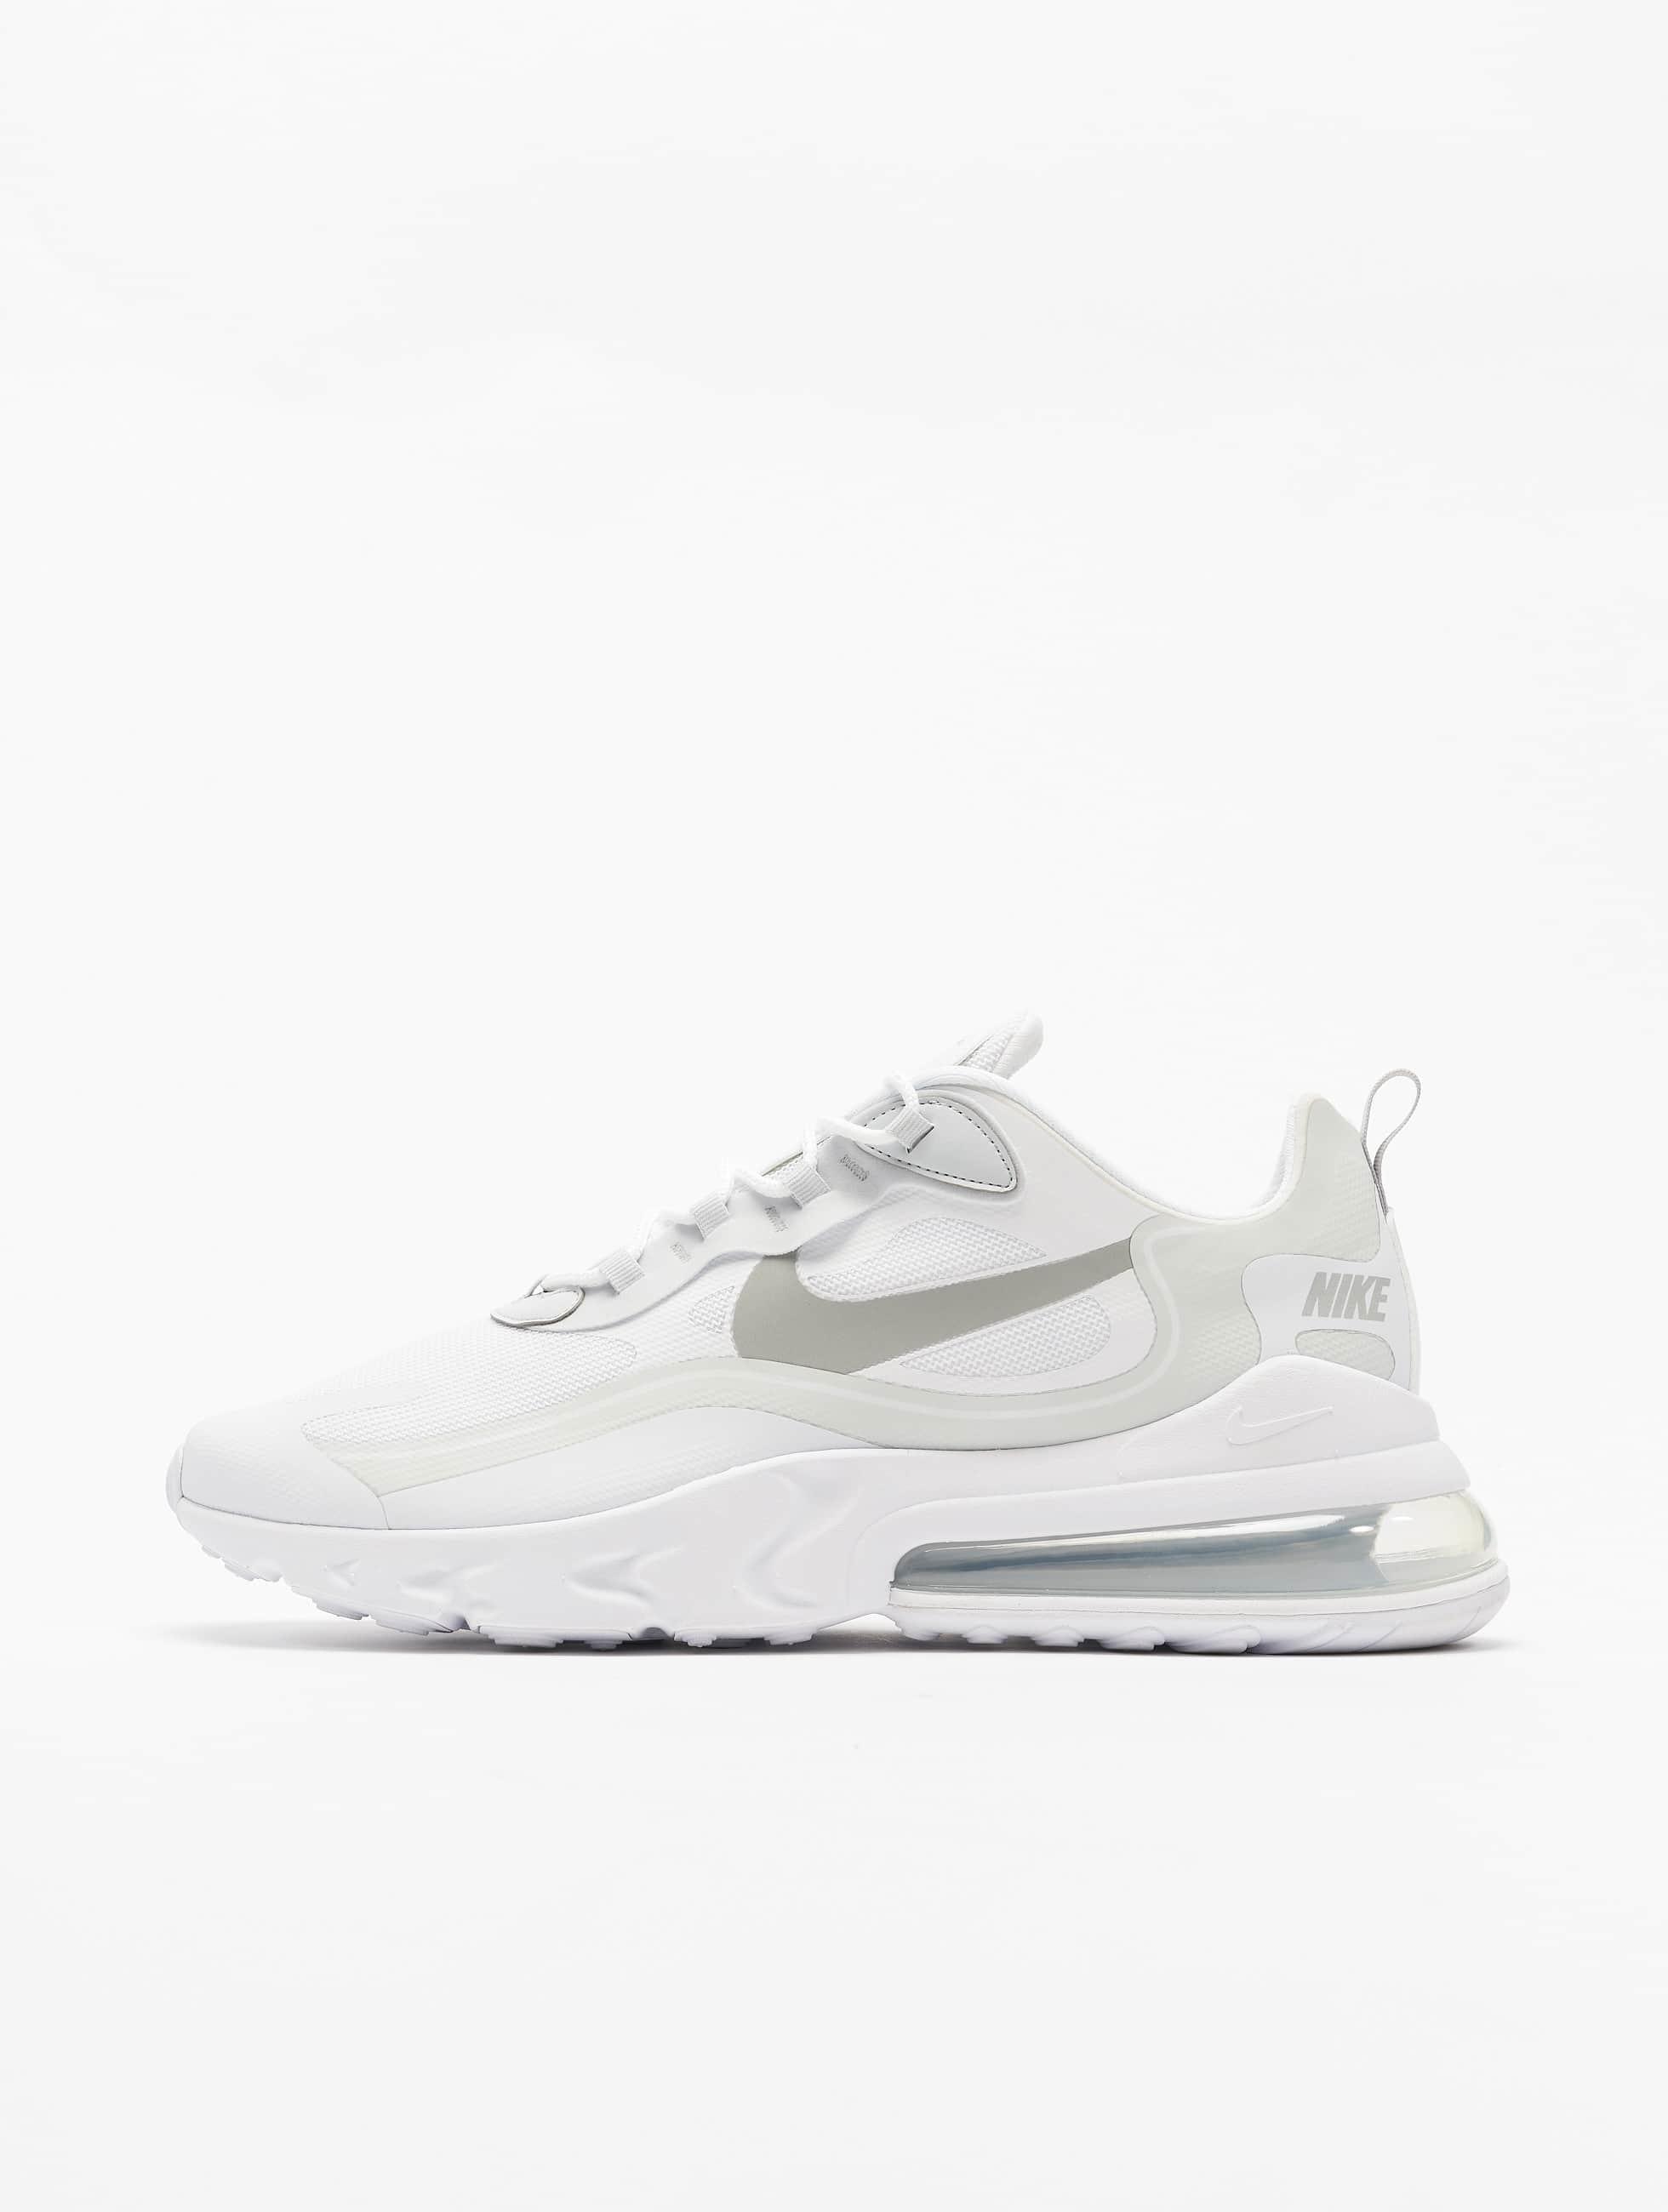 Nike Air Max 270 React Sneakers WhiteLt Smoke GreyPure Platinum